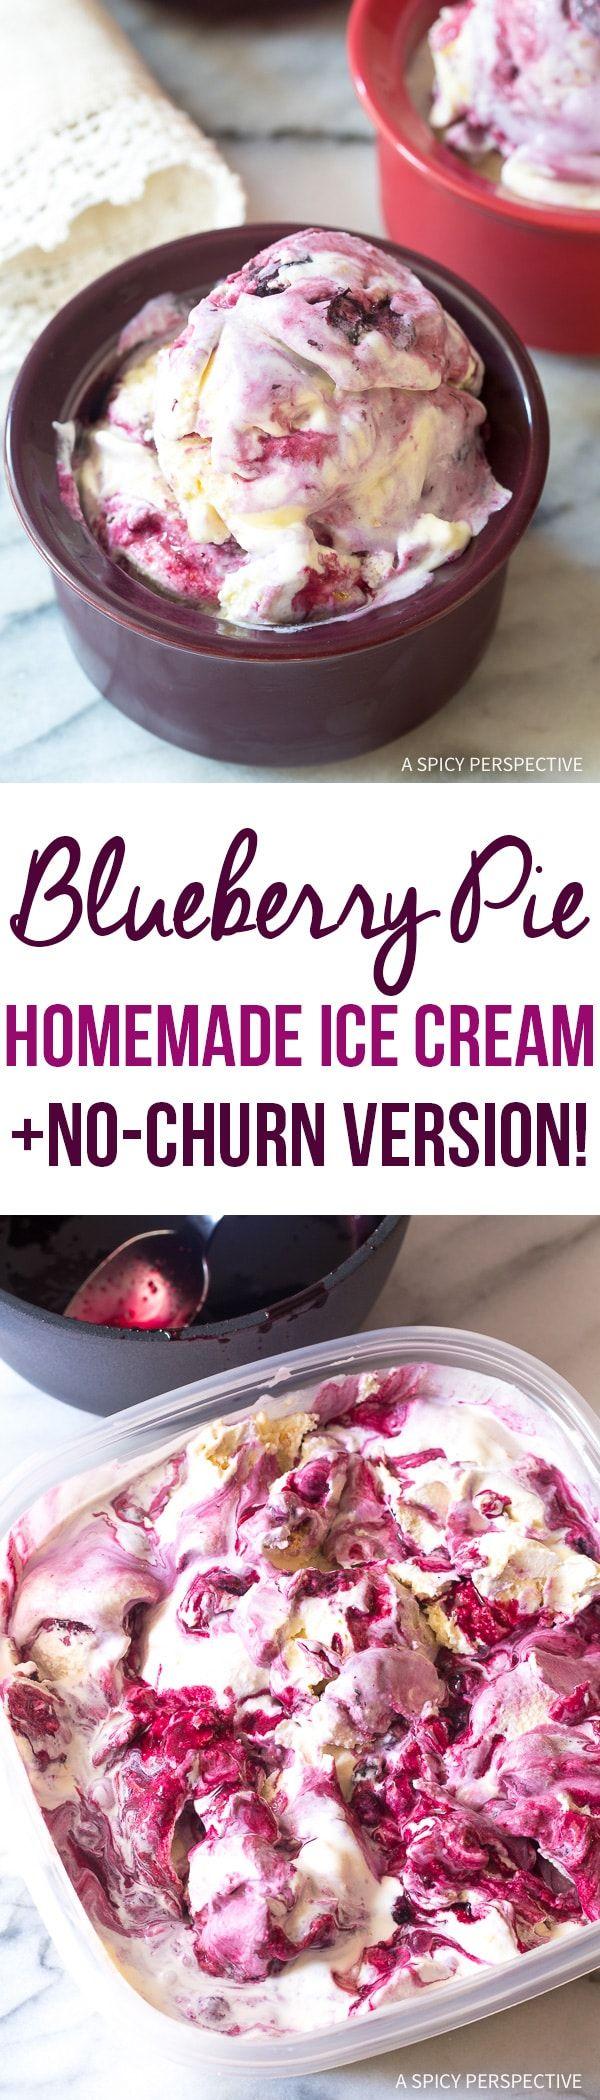 Amazing Blueberry Pie Homemade Ice Cream Recipe + Quick No-Churn Version! via @spicyperspectiv